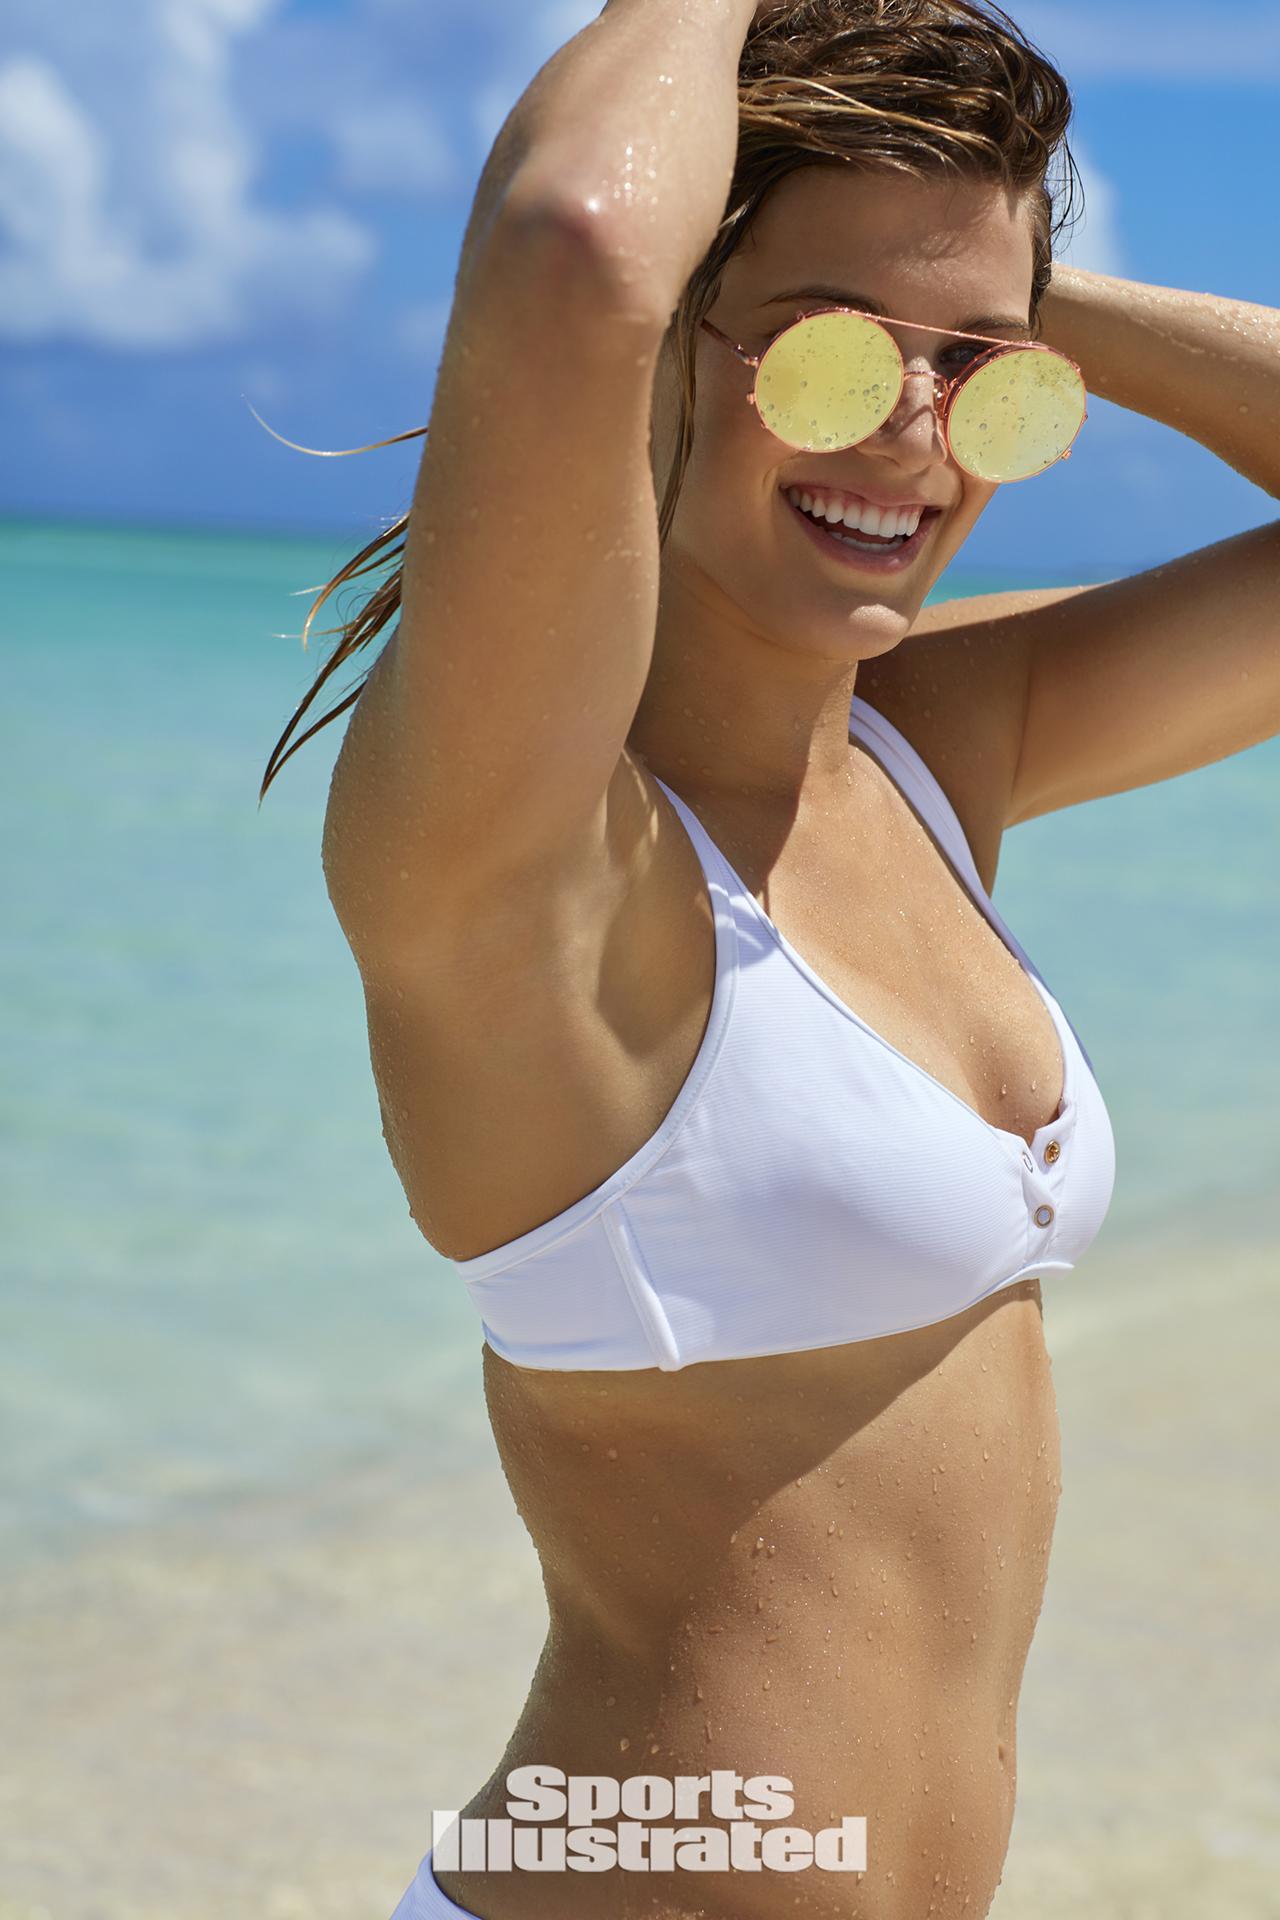 PHOTOS - Eugénie Bouchard topless pour le Sports Illustrated